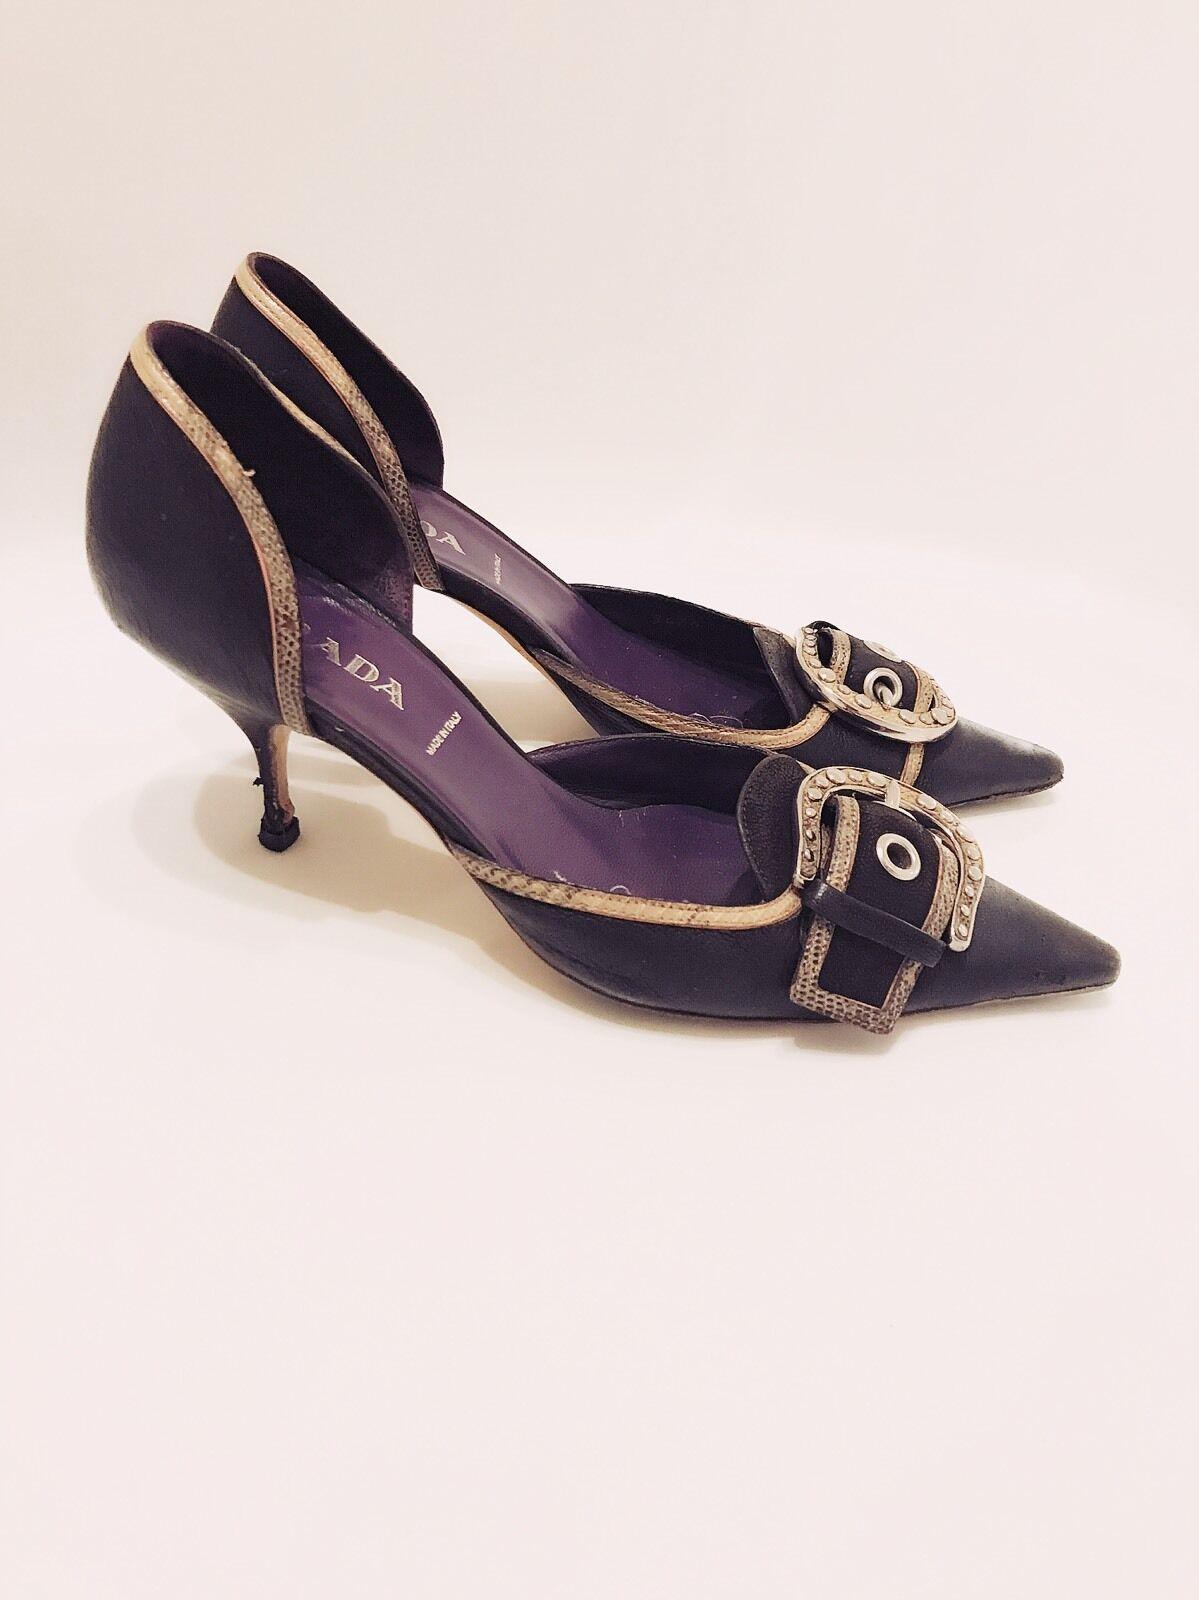 PRADA - Gold Lizard Trim Purple Toe Pelle Buckle Pointed Toe Purple D'Orsay Pumps 6.5 37 3ea380